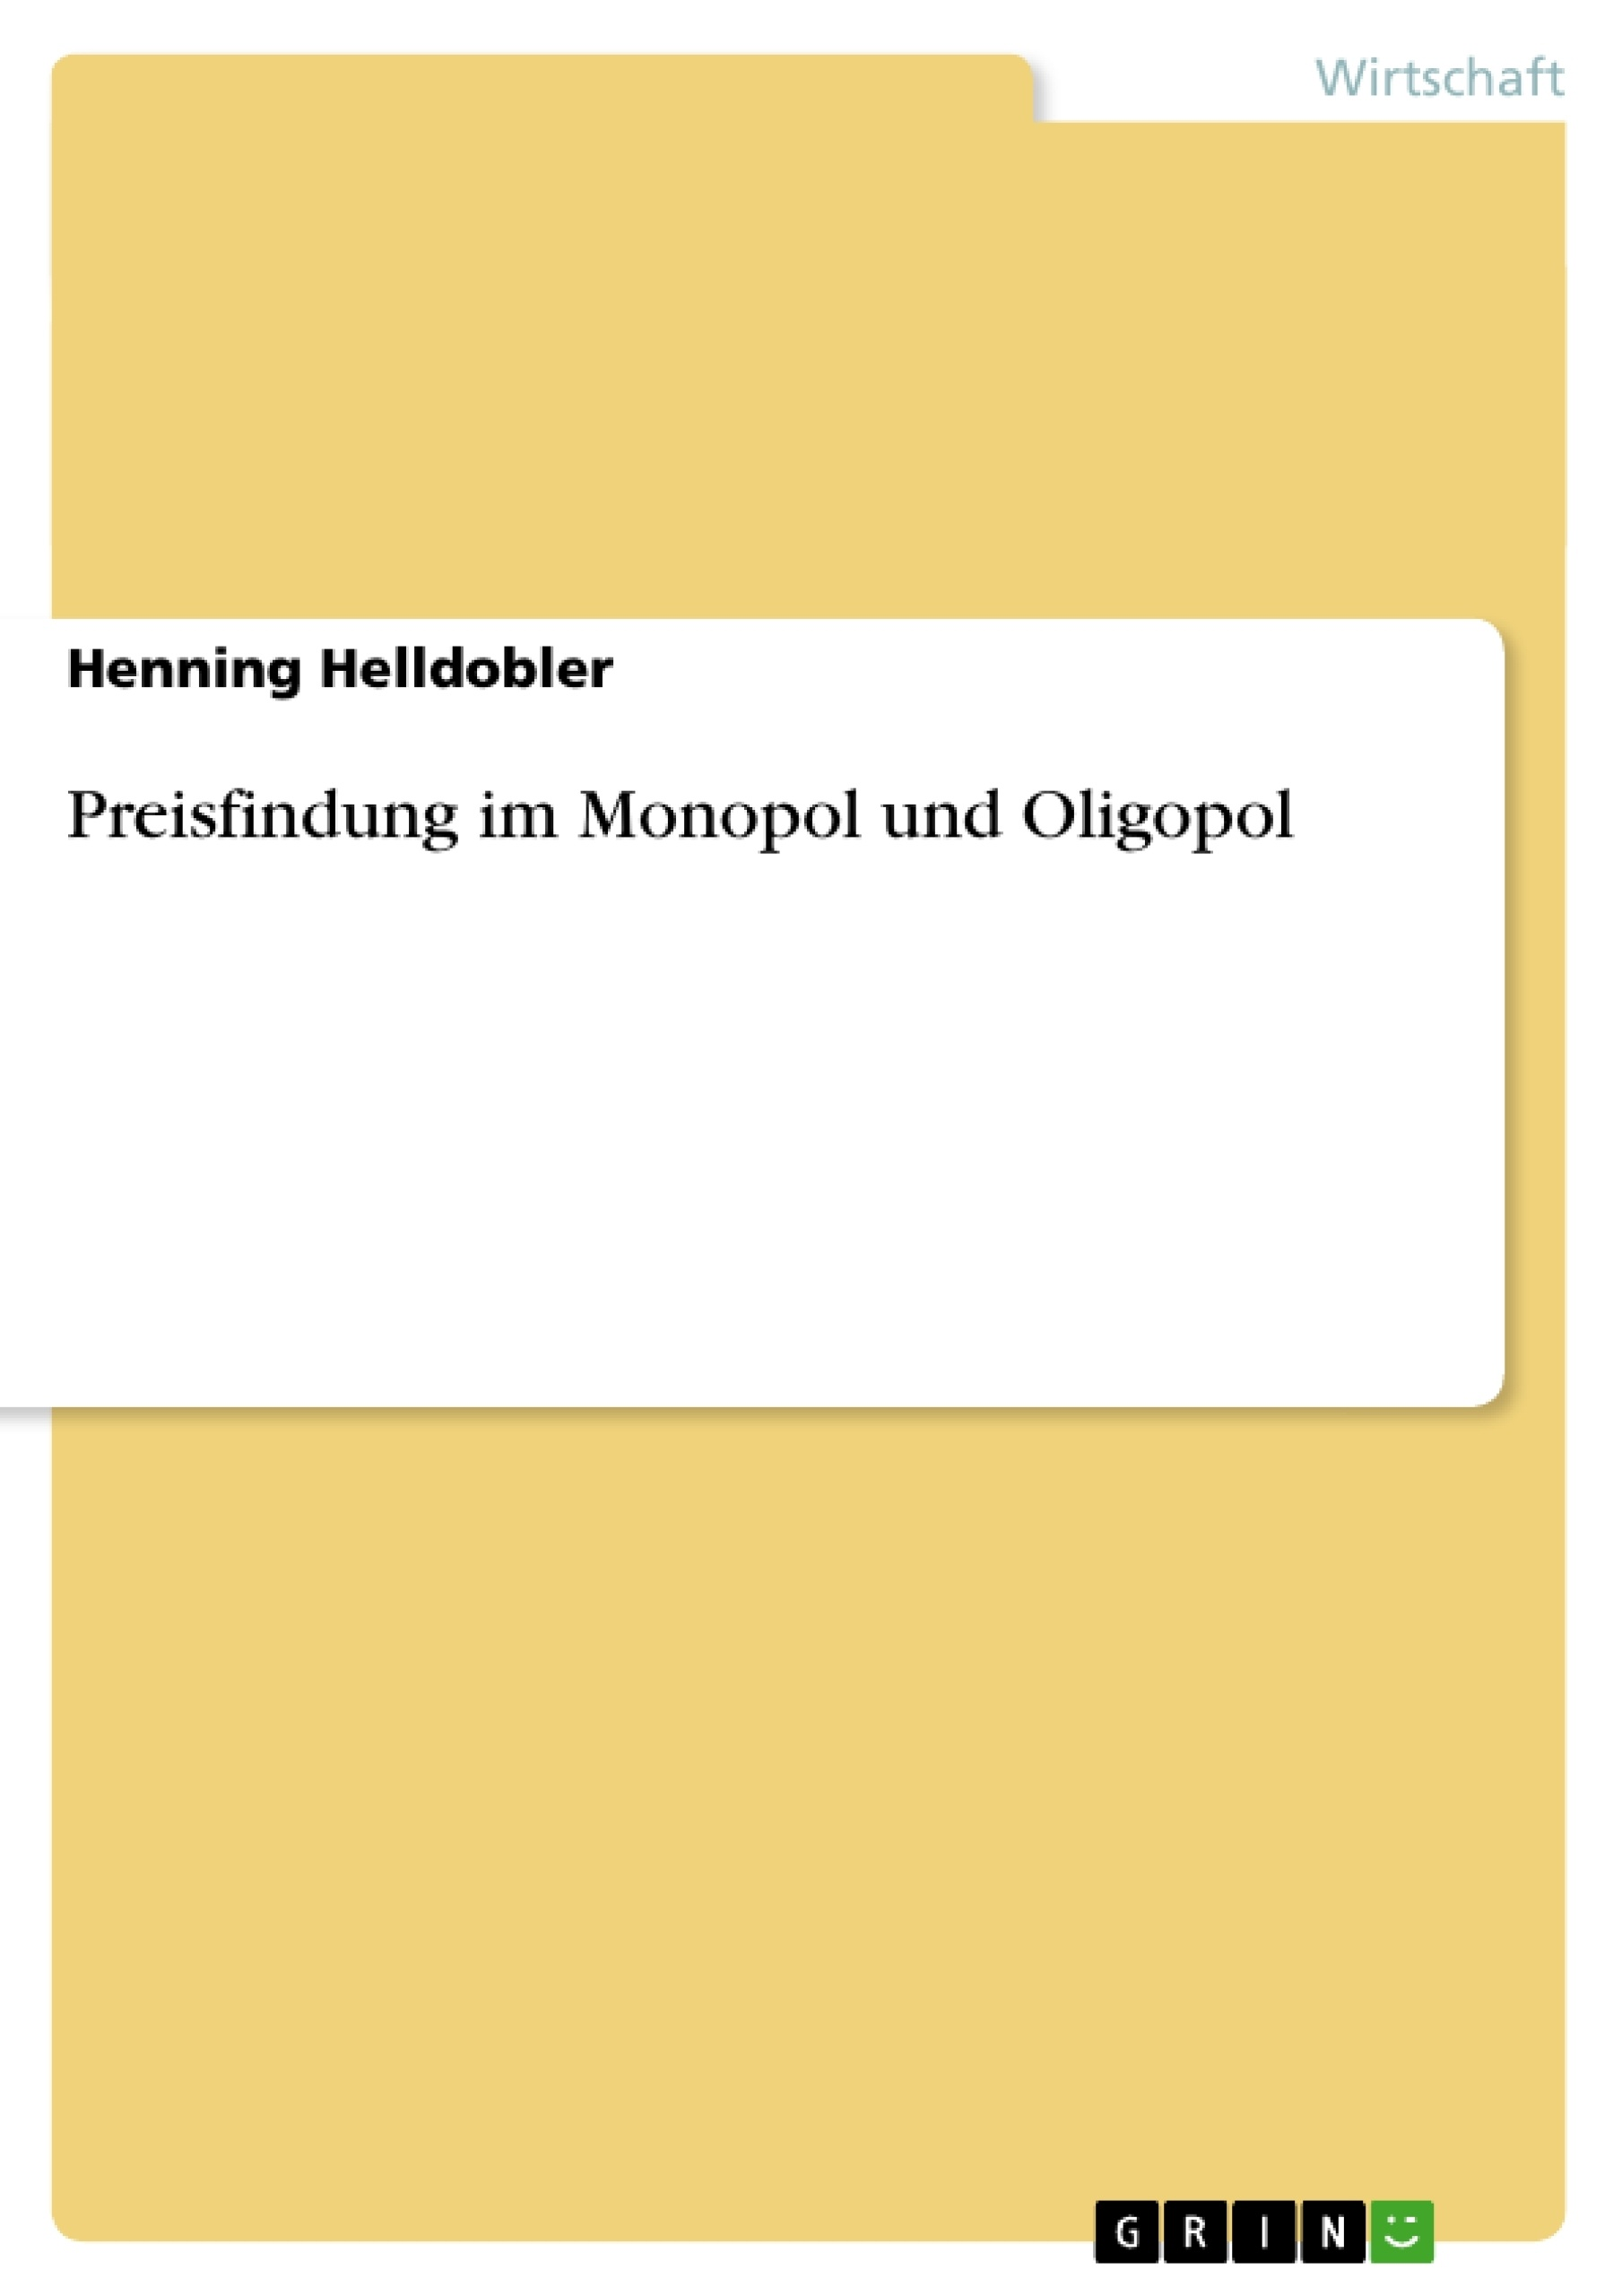 Titel: Preisfindung im Monopol und Oligopol